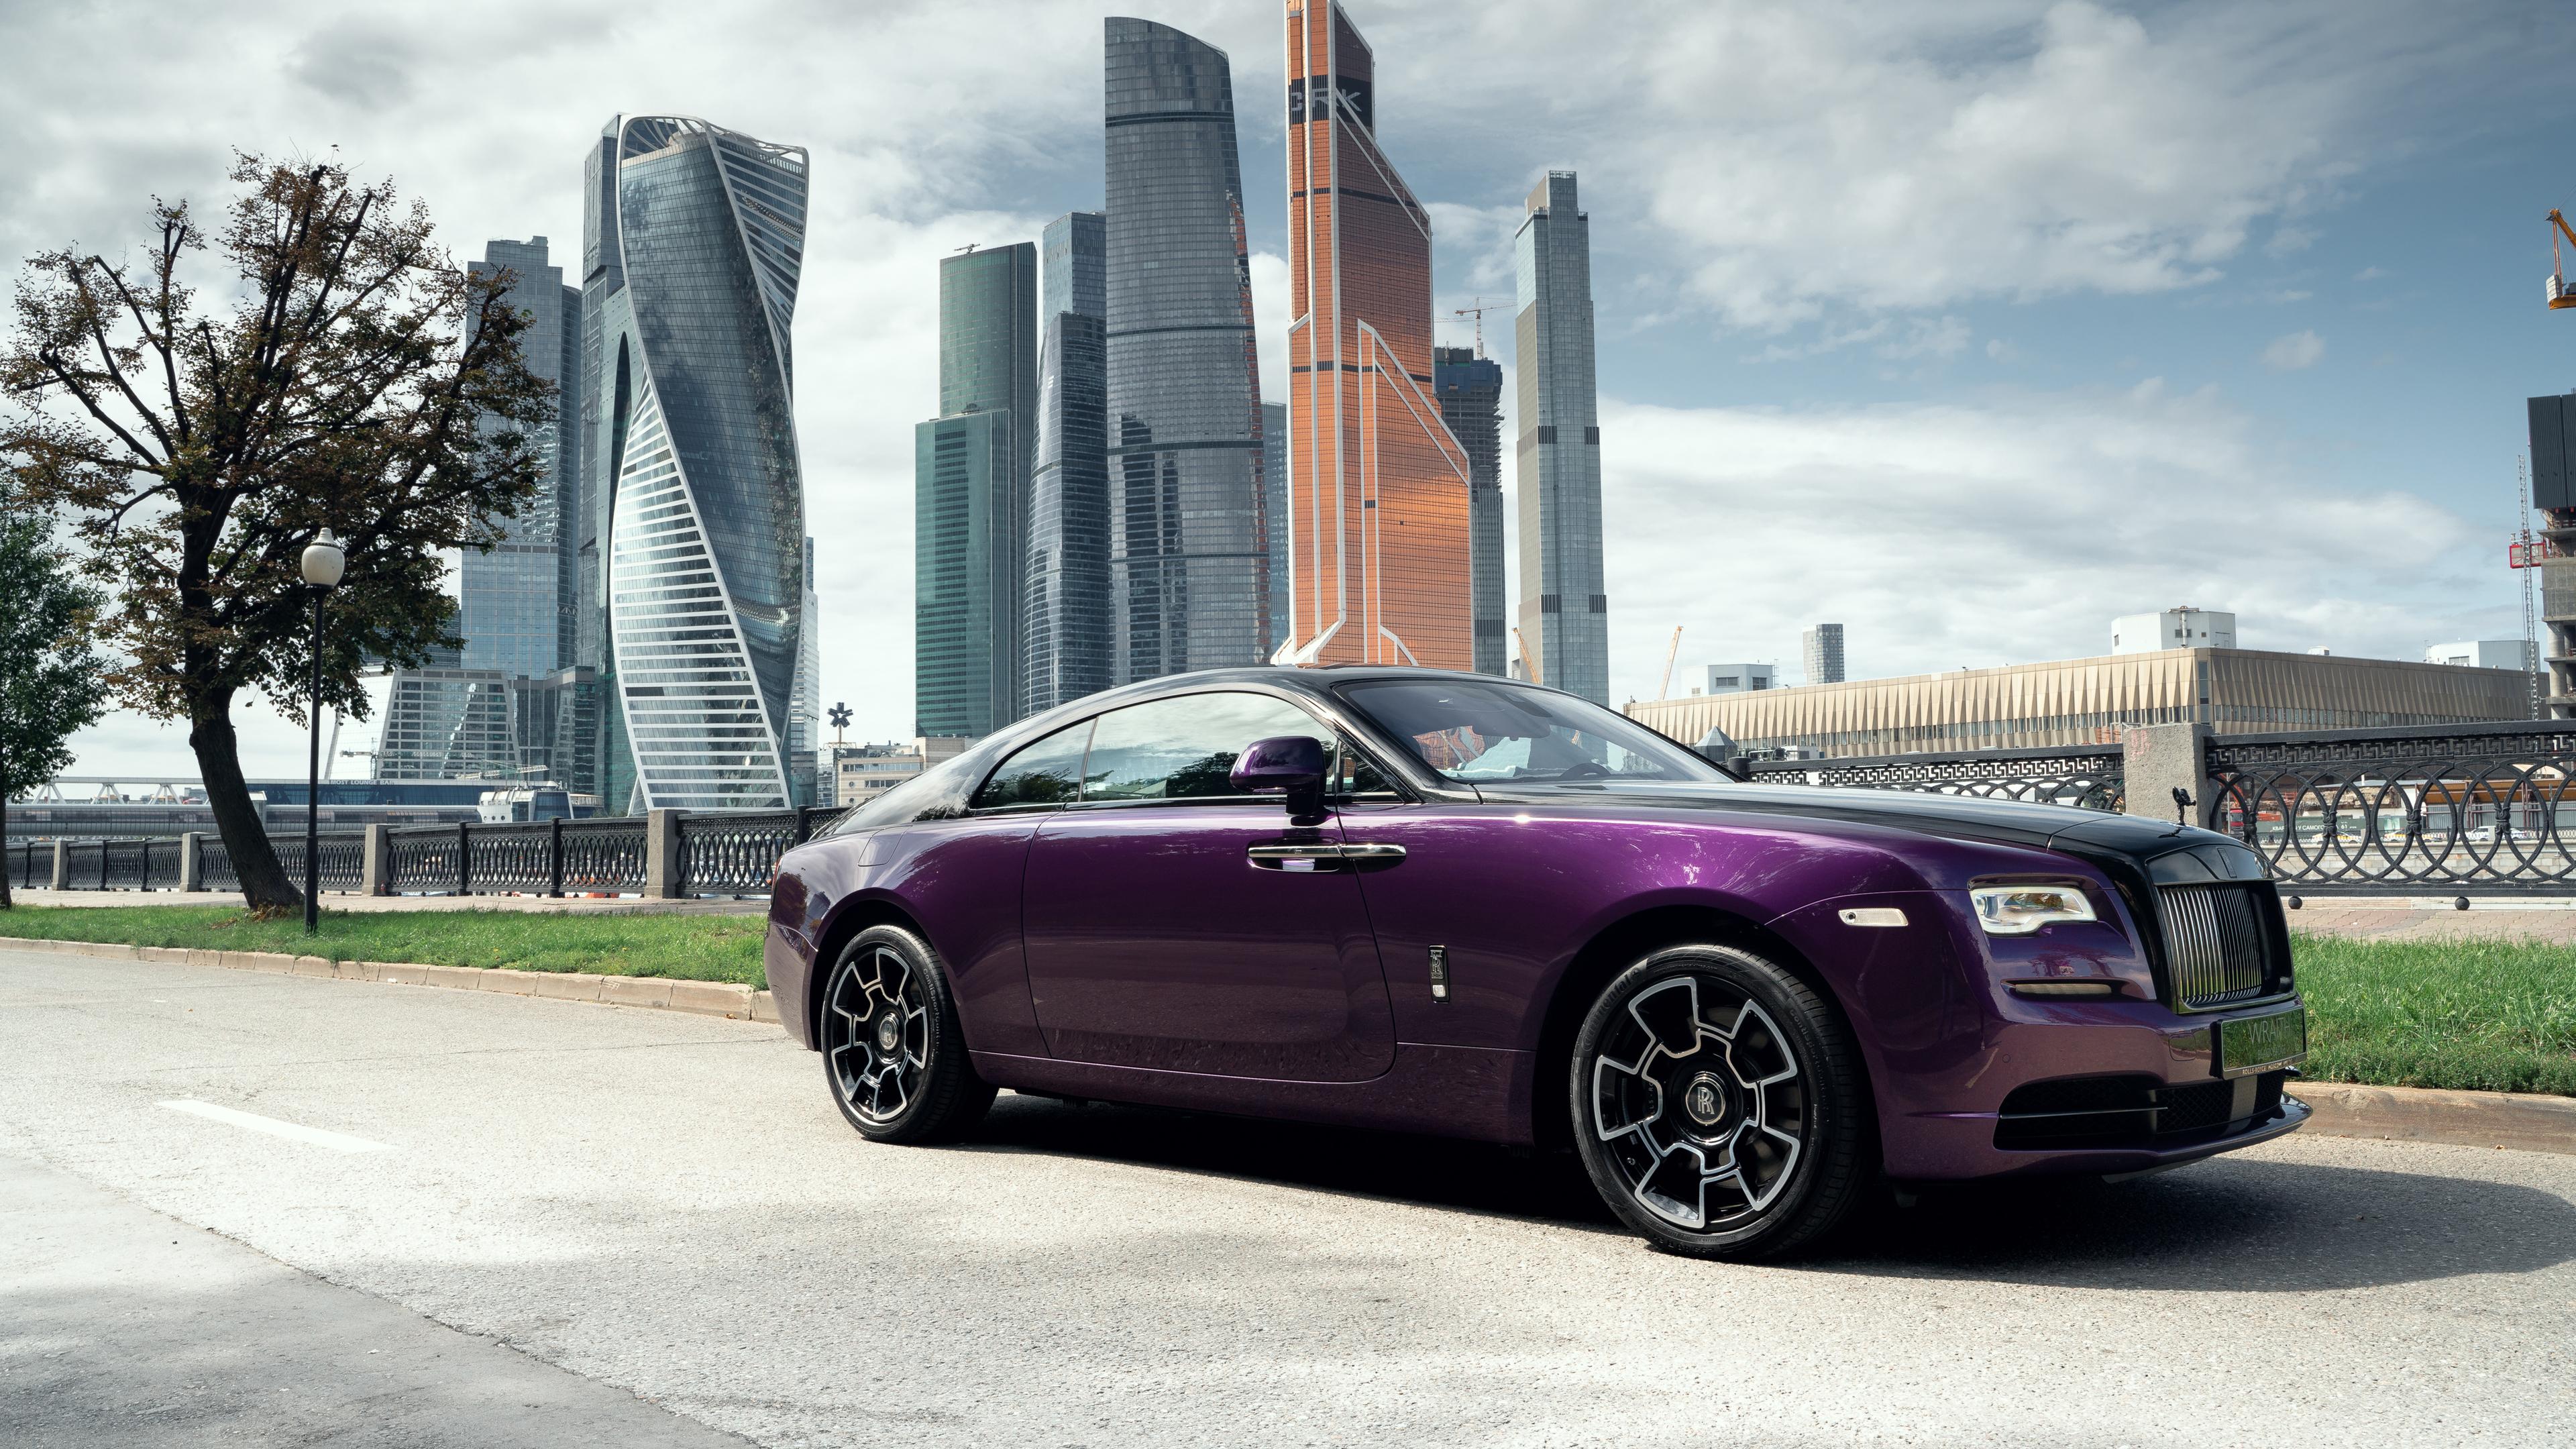 rolls royce wraith black and bright 2019 1572660889 - Rolls Royce Wraith Black And Bright 2019 - rolls royce wraith wallpapers, rolls royce wallpapers, hd-wallpapers, cars wallpapers, 5k wallpapers, 4k-wallpapers